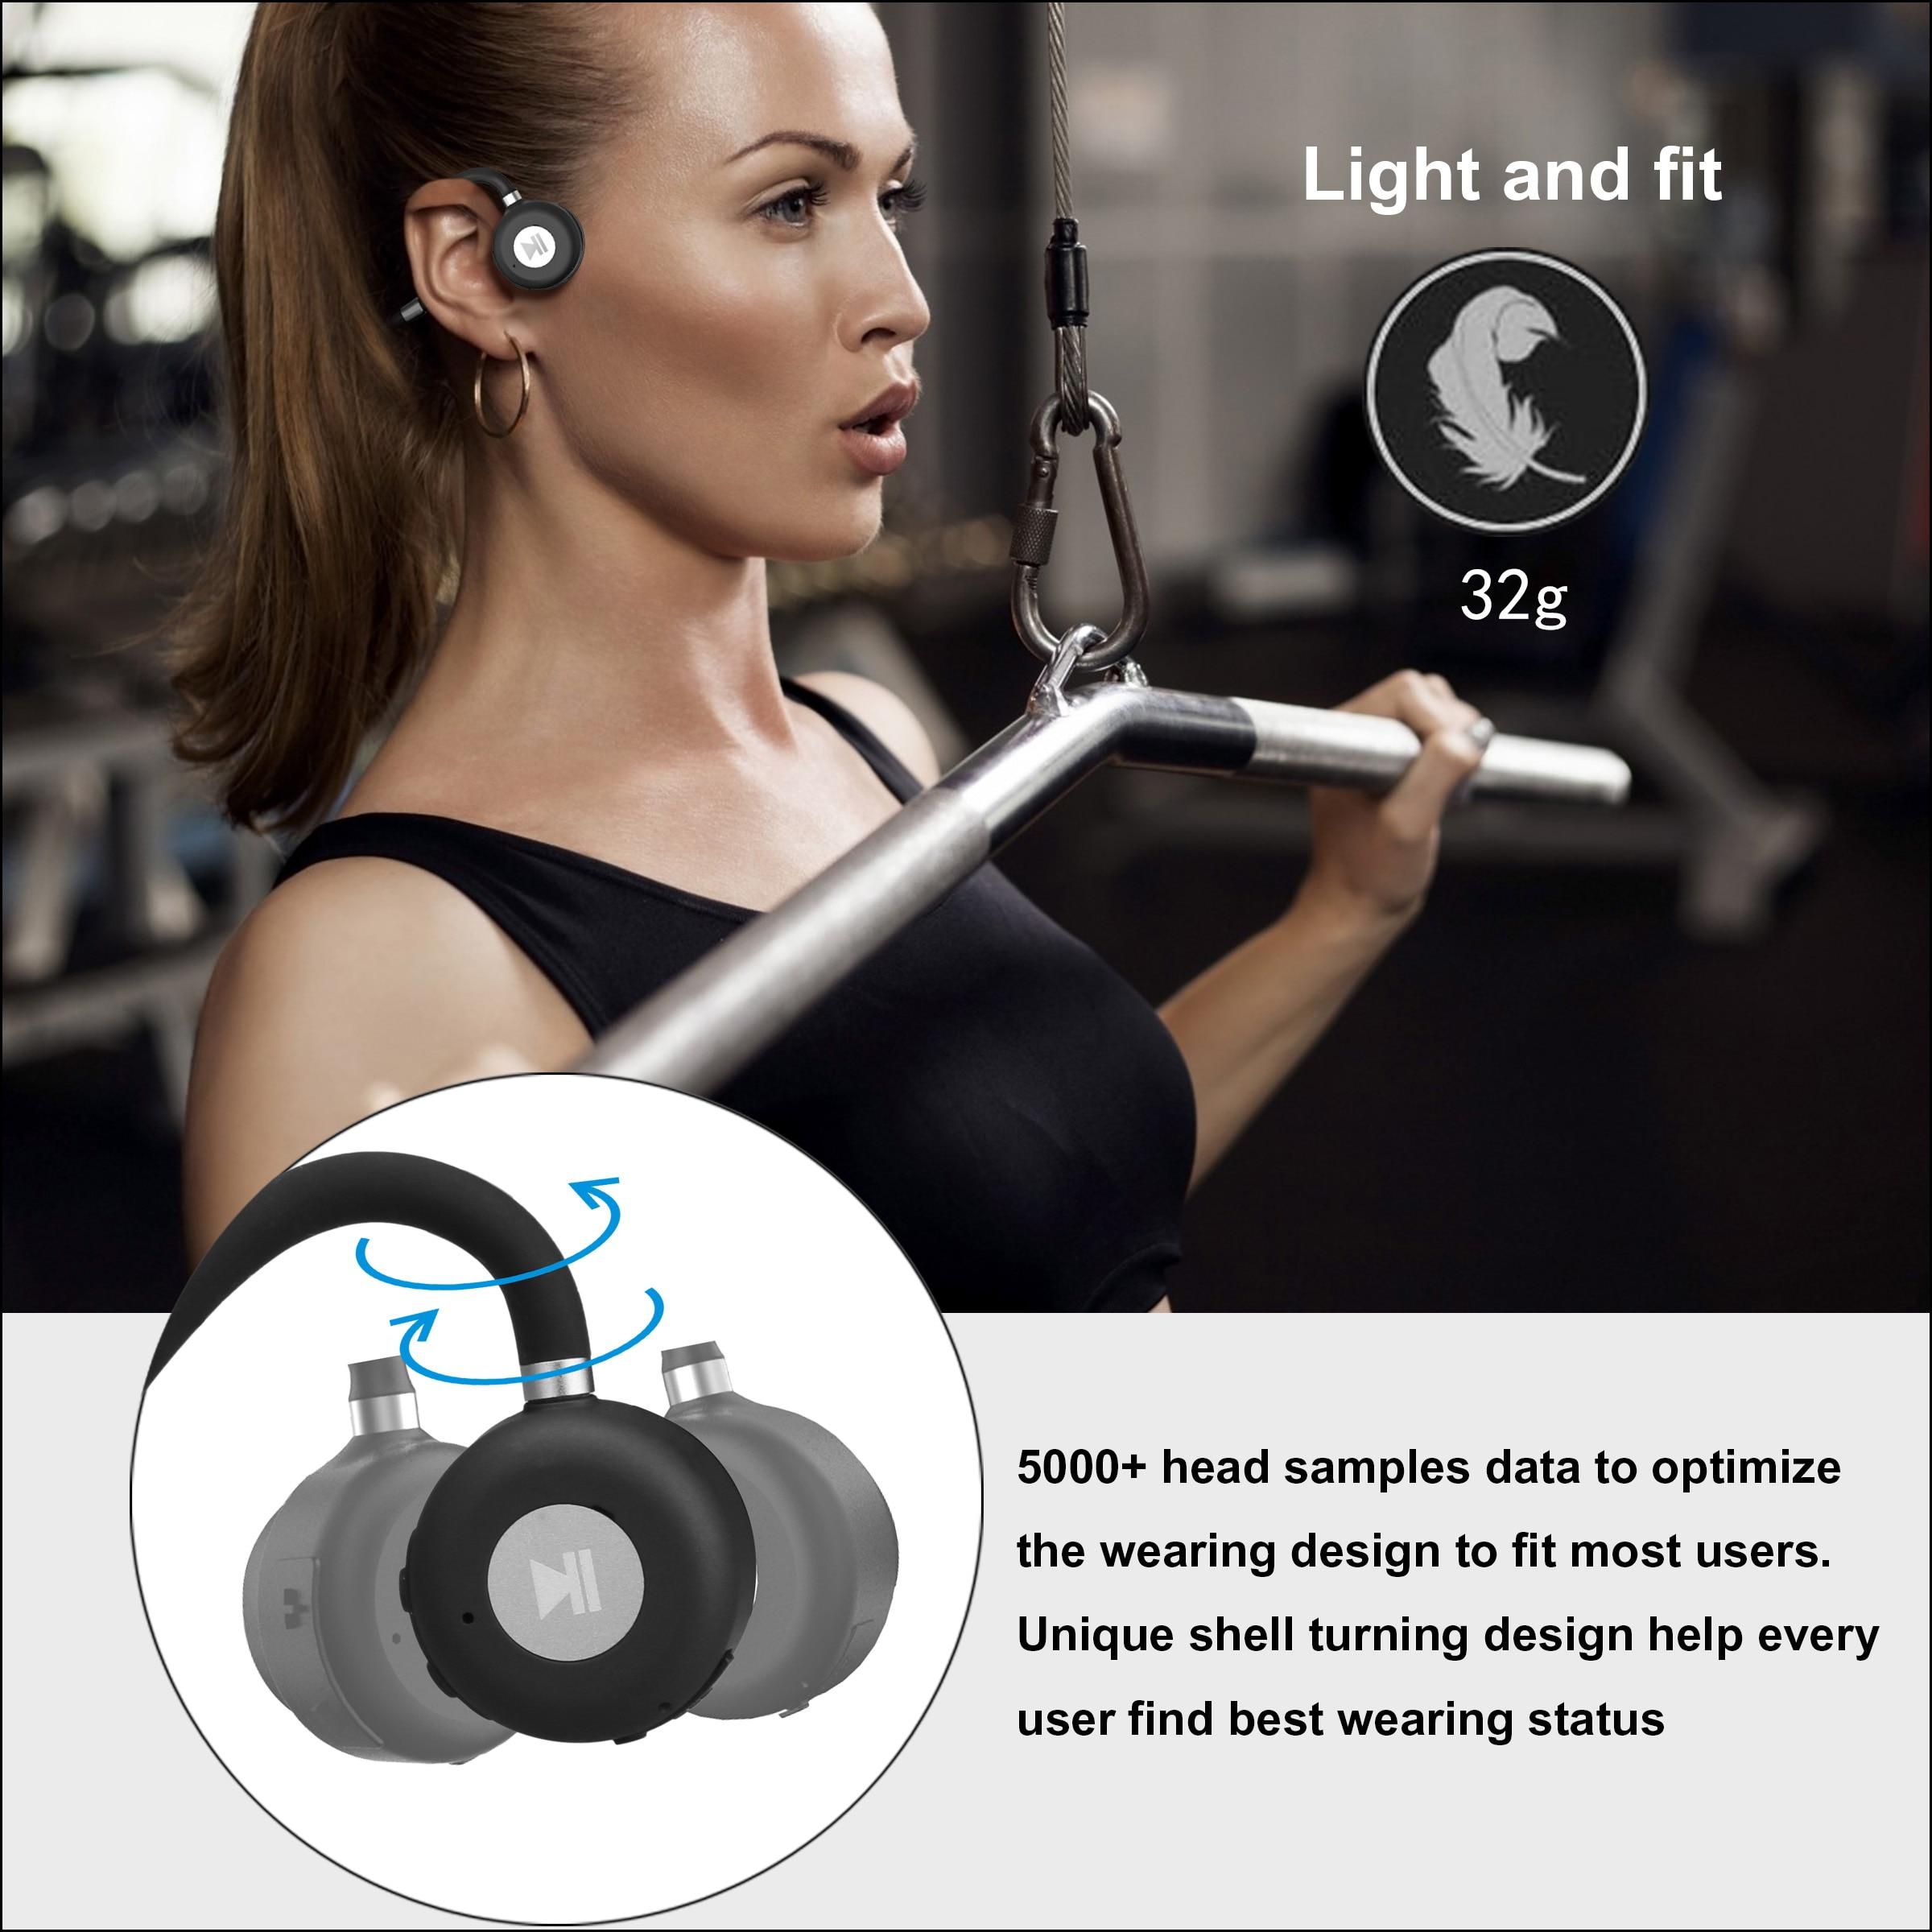 HUHD Bone Conduction Earbuds Wireless Headphone BT 5.0 Titanium Open Ear Wireless Sports Headset Handsfree Headsets Lightweight enlarge